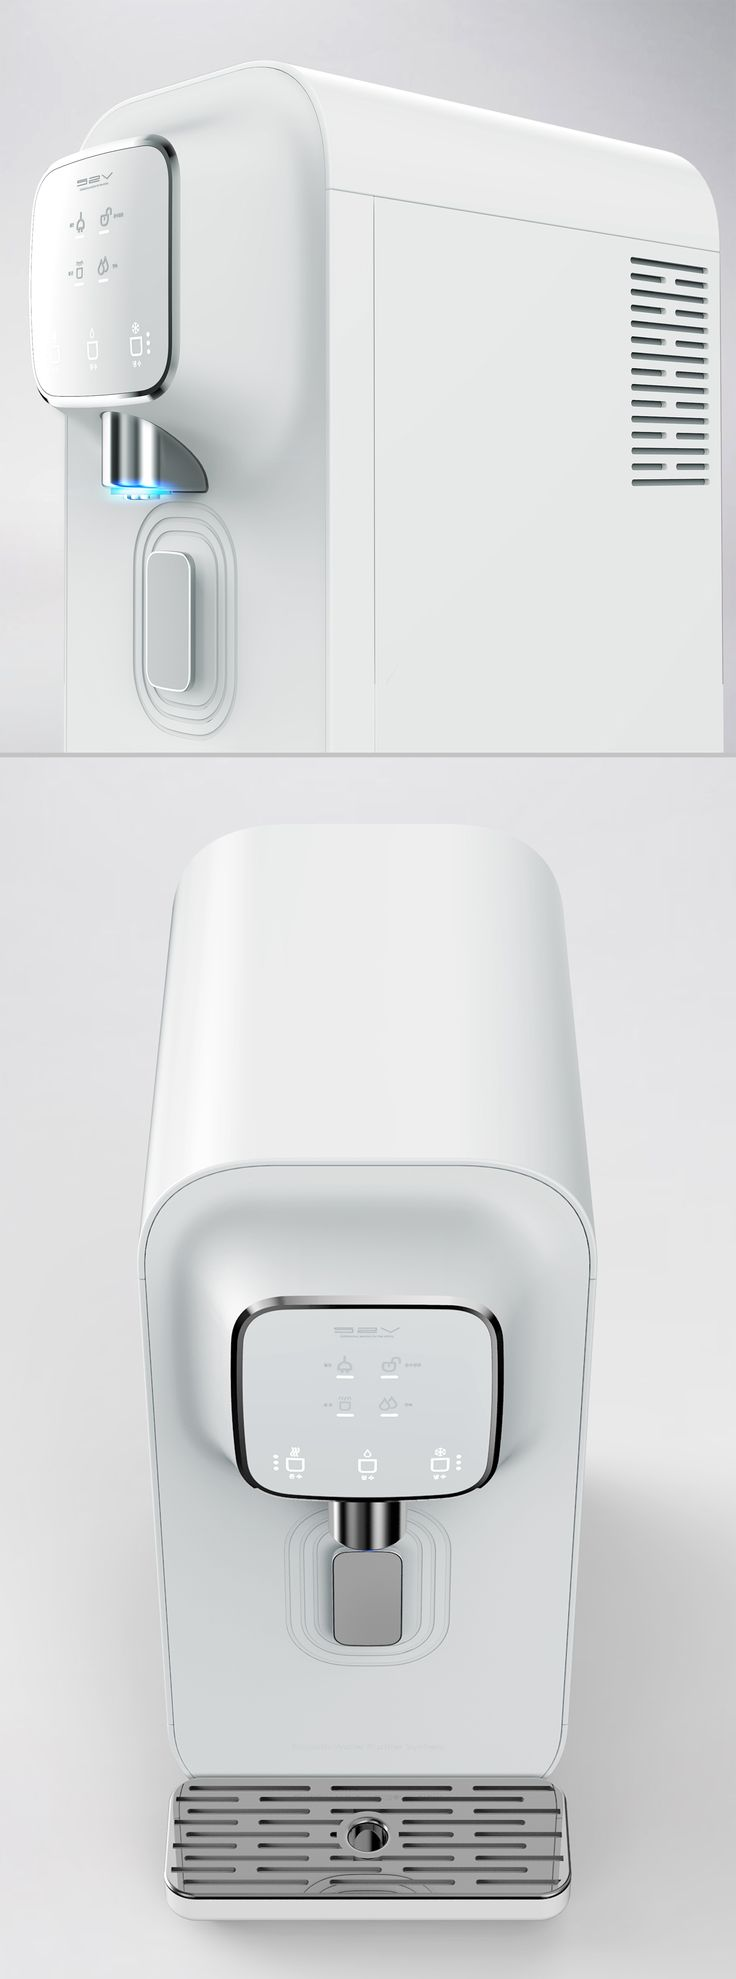 Product design / Industrial design / 제품디자인 / 산업디자인 / water purifier / Appliance /design